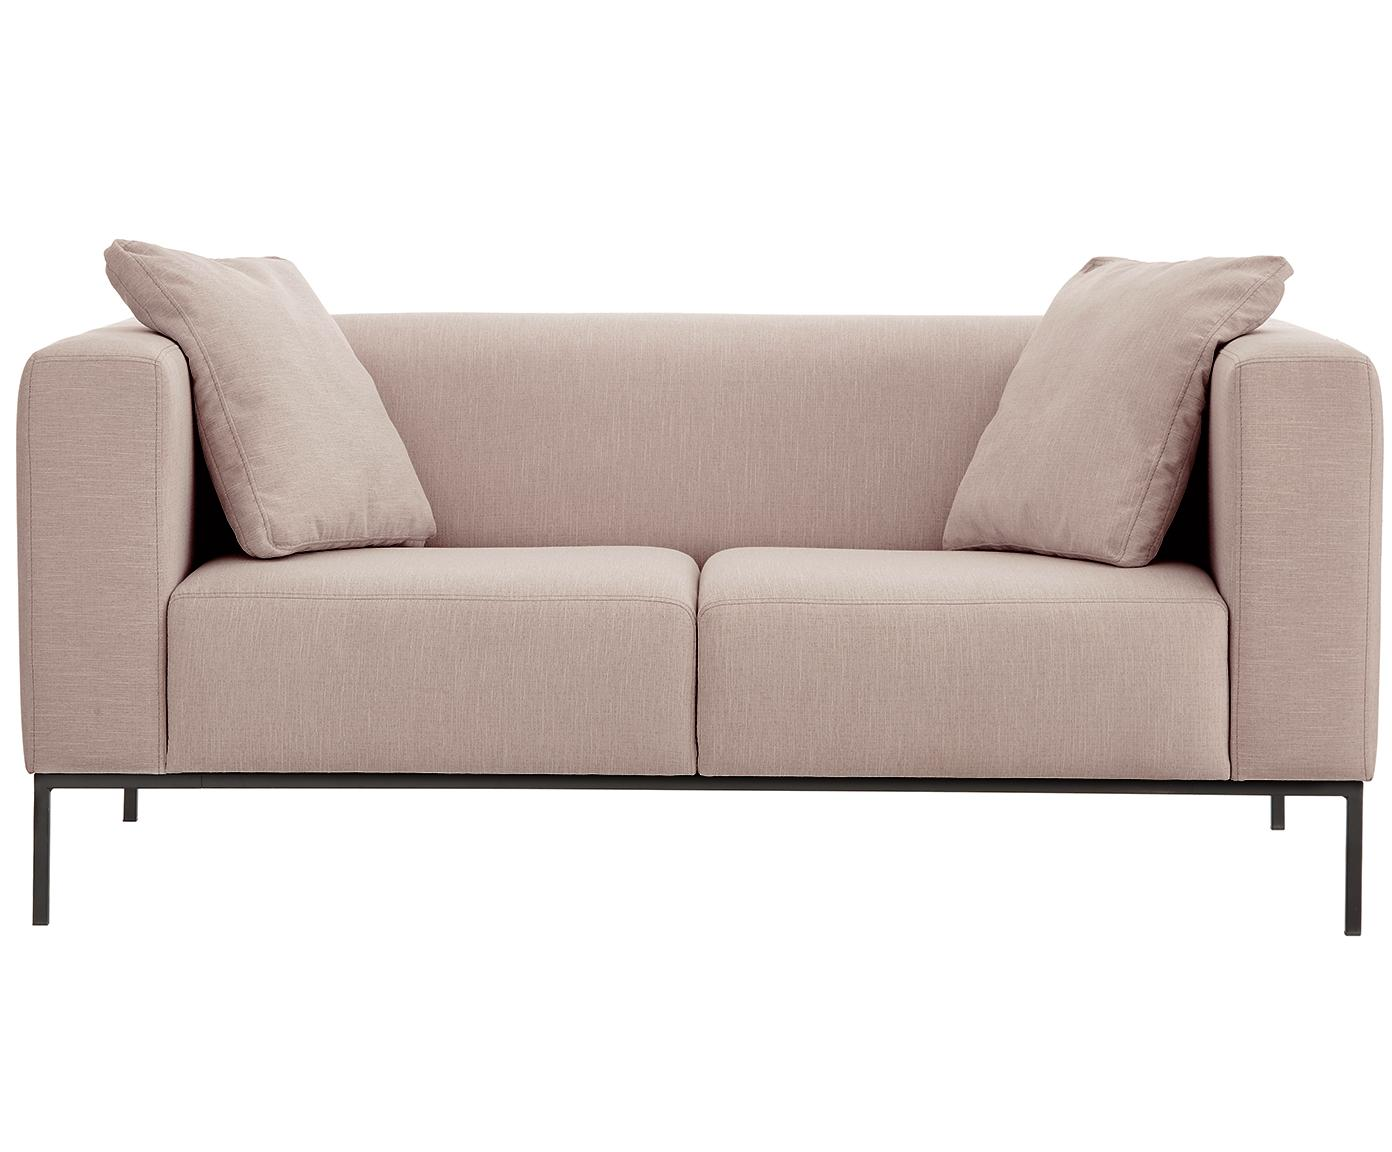 Bank Carrie (2-zits), Bekleding: polyester, Frame: spaanplaat, hardboard, mu, Poten: gelakt metaal, Webstoff Altrosa, B 176 x D 86 cm